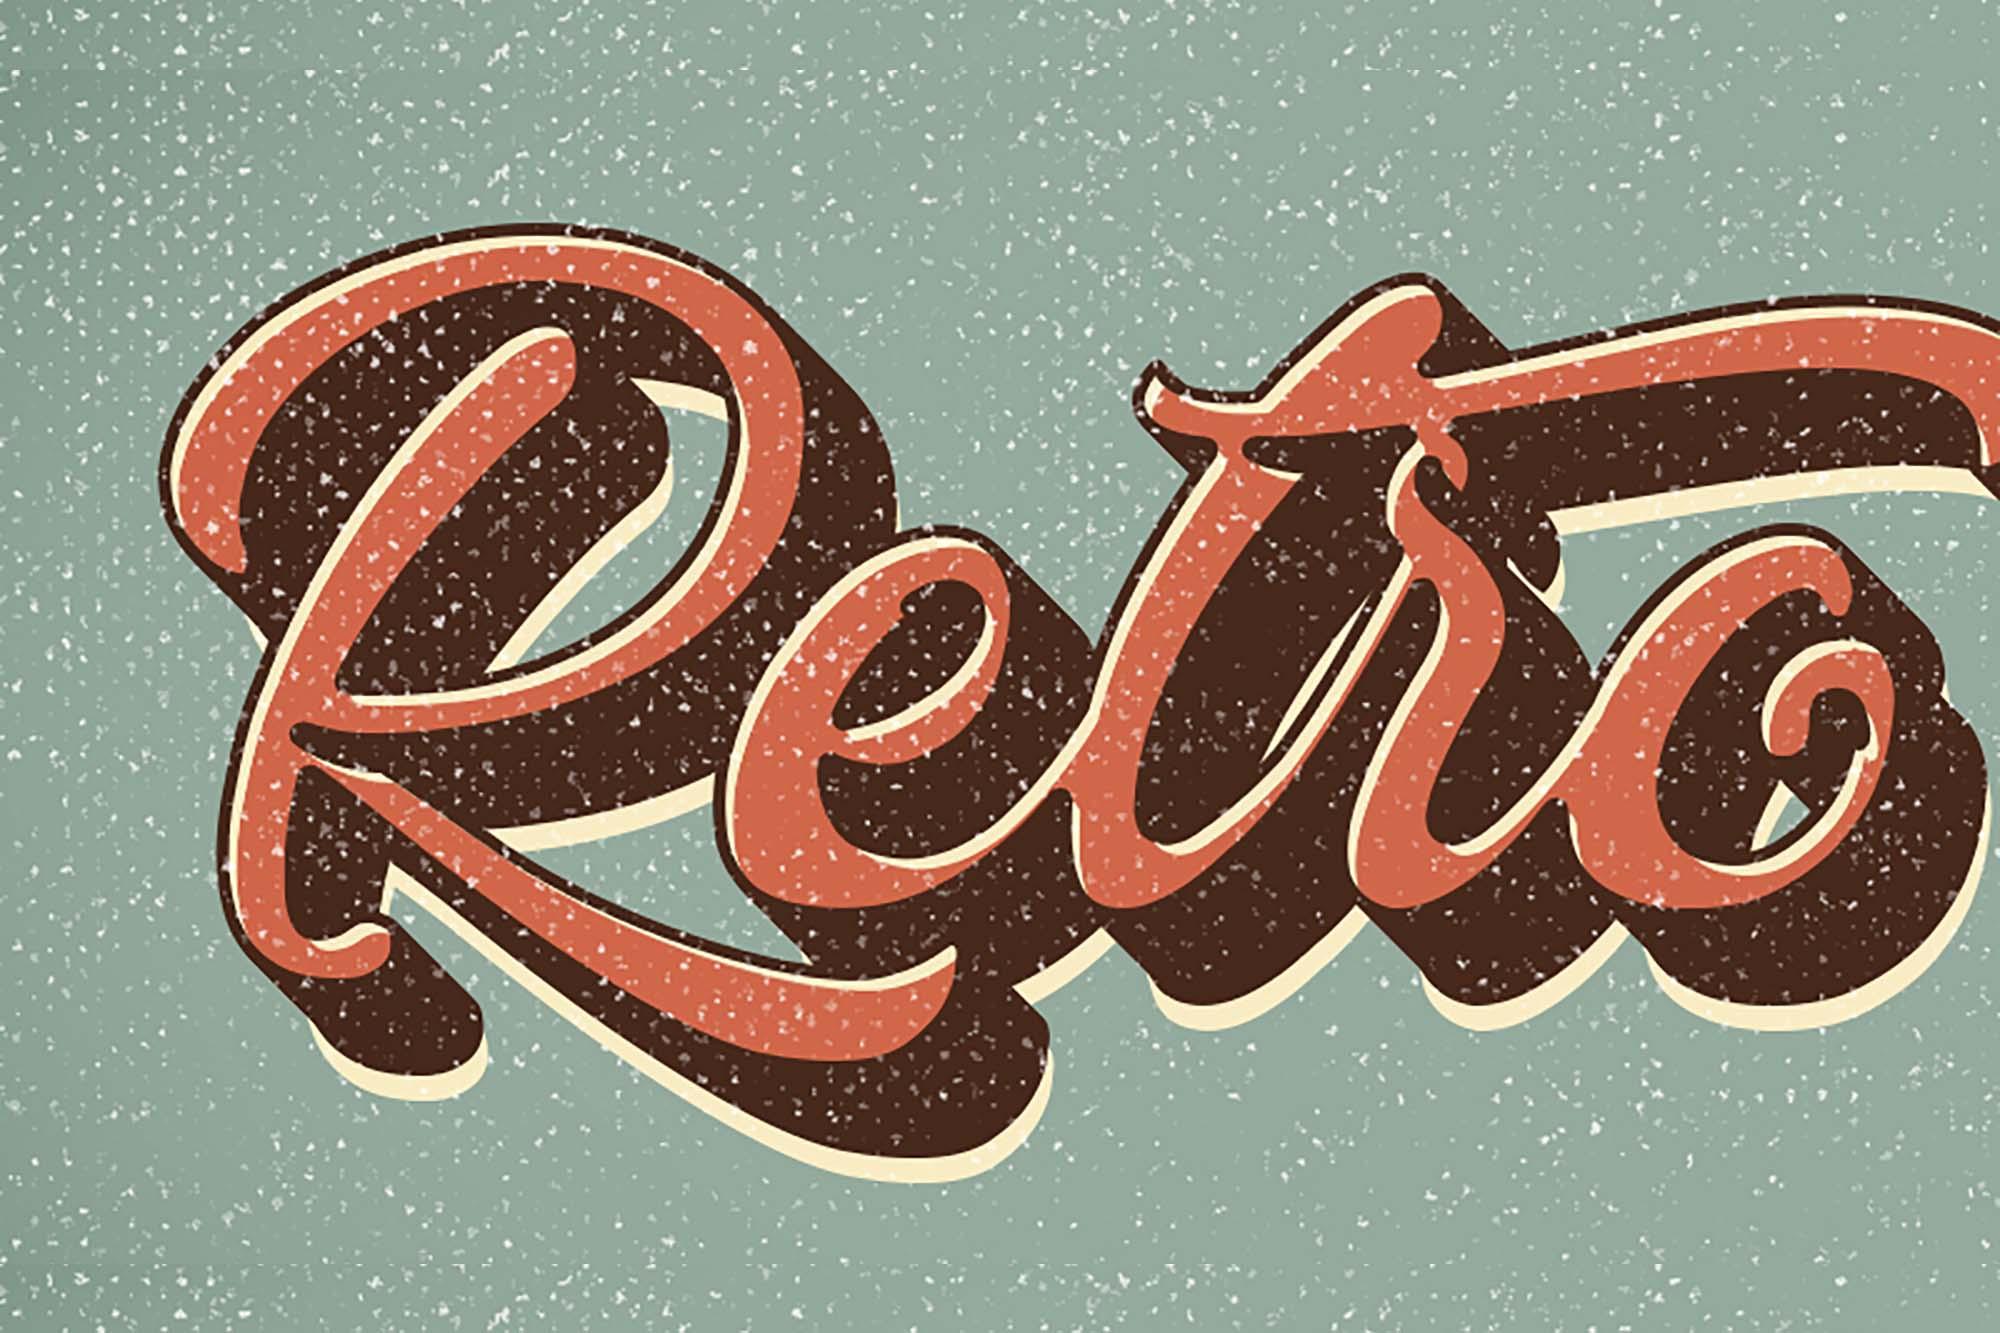 Retro Vintage Text Effect 1